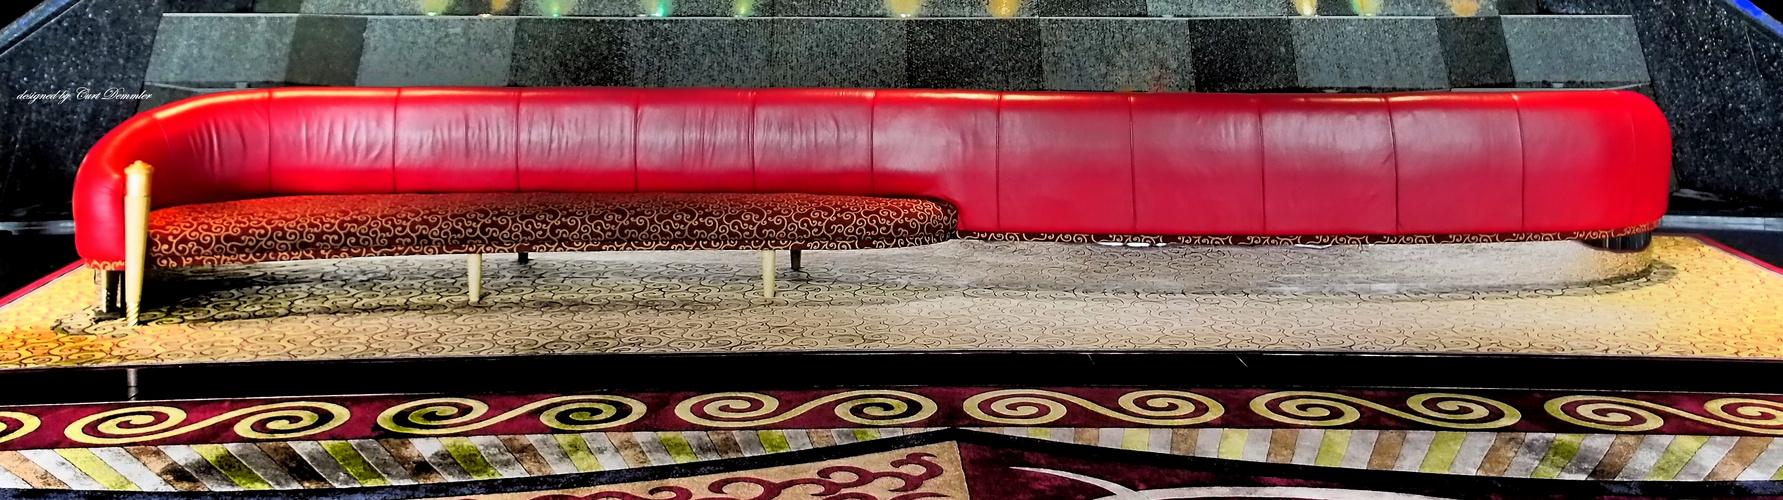 Full Size of Langes Sofa Sofakissen Lang Lange Tisch Sofabord Sofaborde Lounge Stilecht Sitzhöhe 55 Cm 3er Grau Grünes Schlafsofa Liegefläche 160x200 Mondo Leder Grün Sofa Langes Sofa